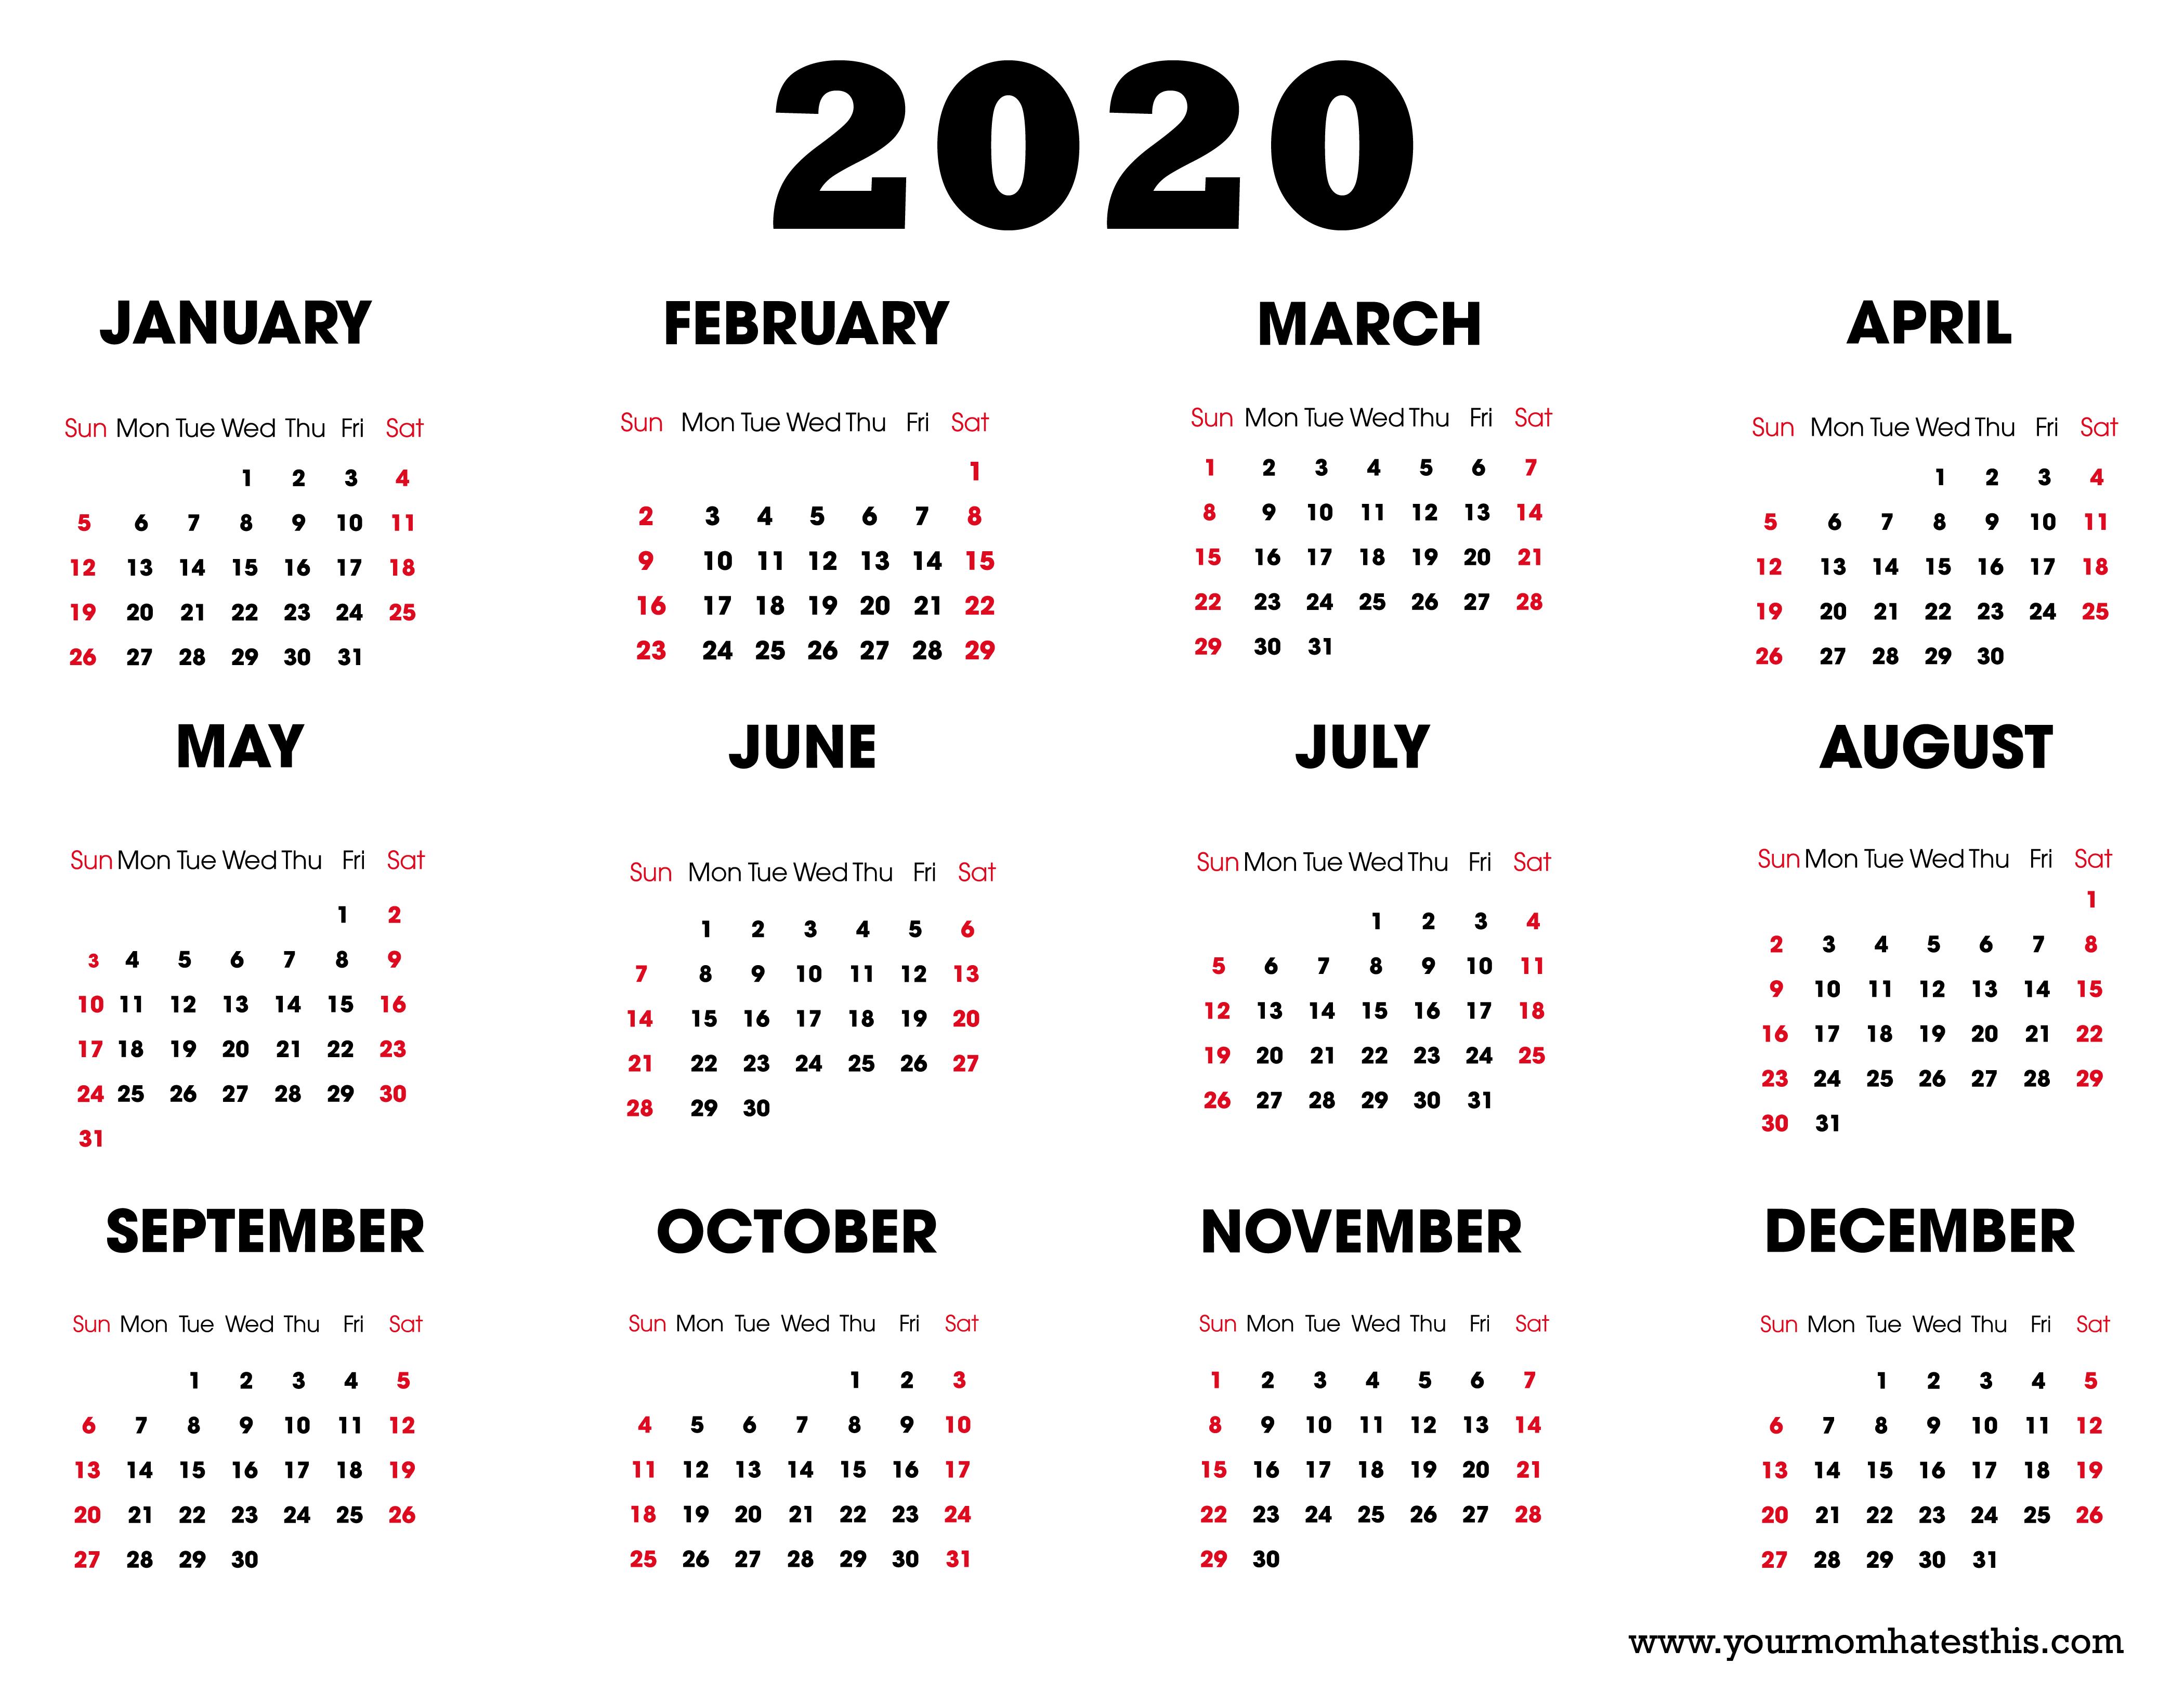 2020 Printable Calendar - Download Free Blank Templates